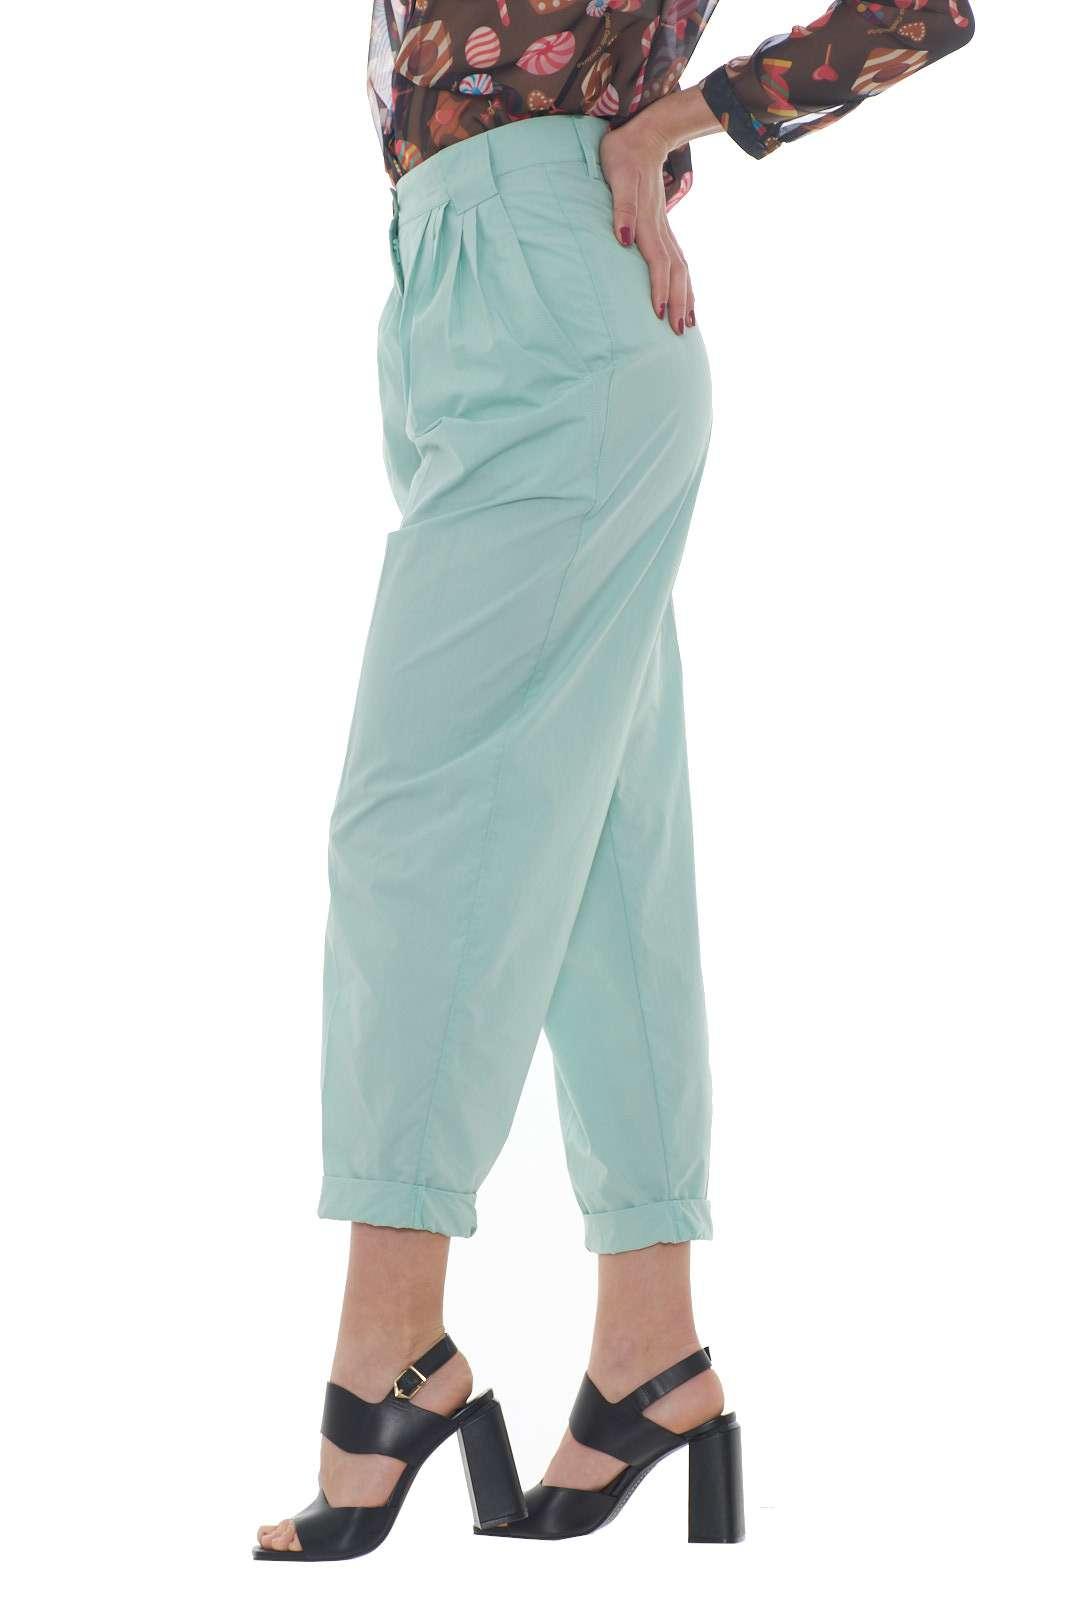 /media/catalog/product/a/i/PE-outlet_parmax-pantaloni-donna-Gold-Case-CC977-B.jpg